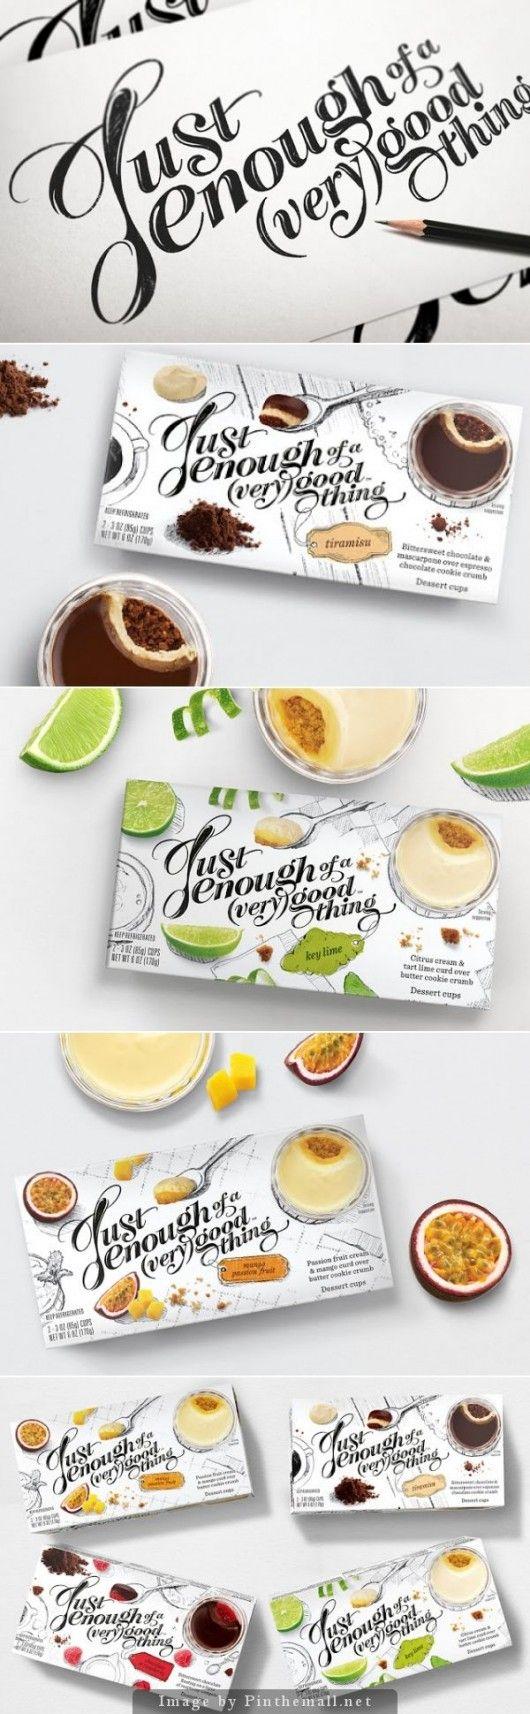 emballage-yahourt-fruit-design